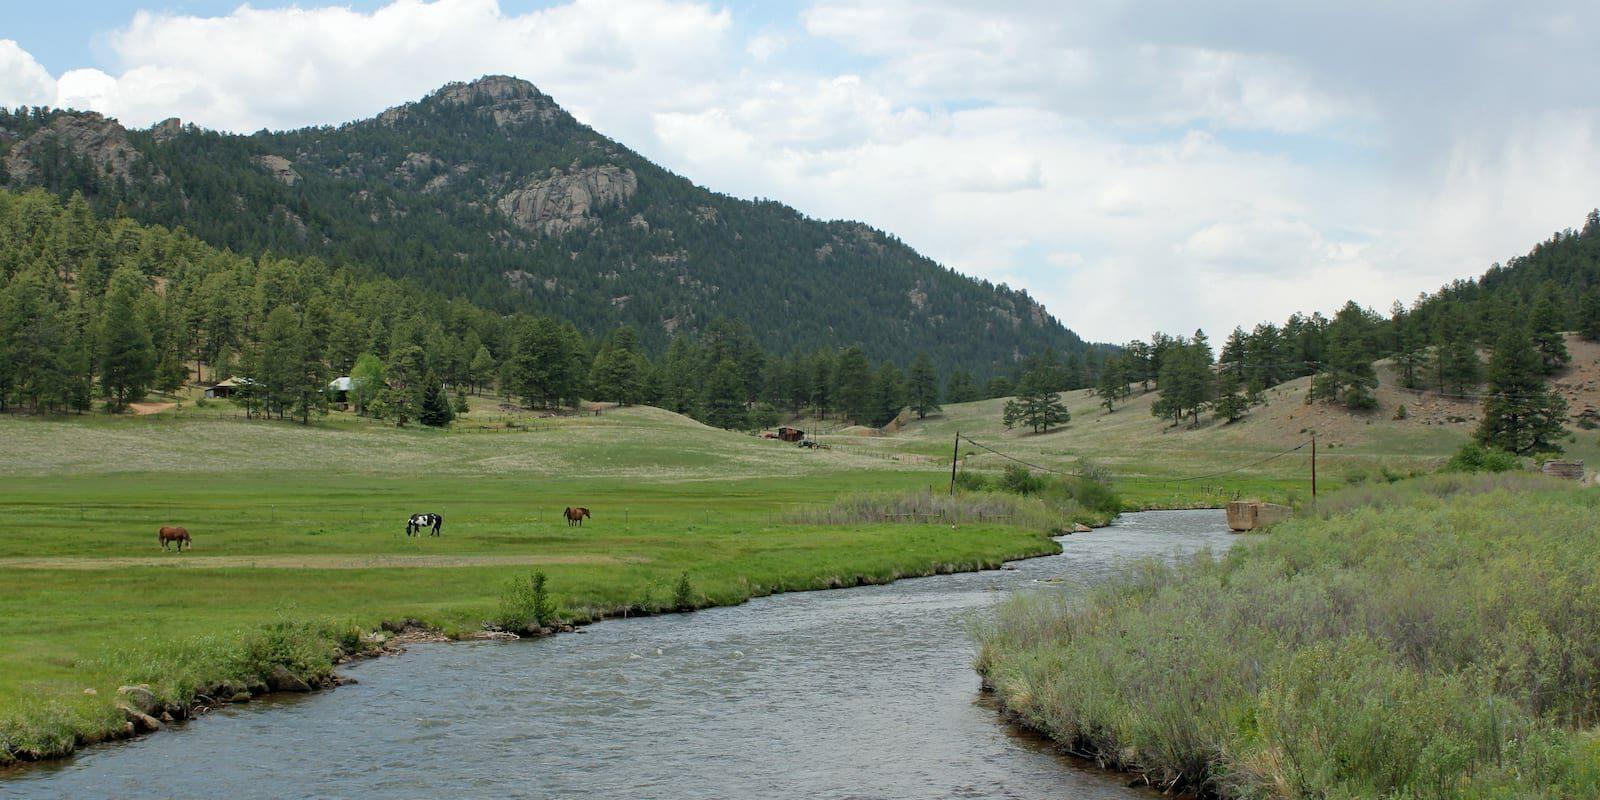 North Fork of the South Platte River Near Buffalo Creek, Colorado